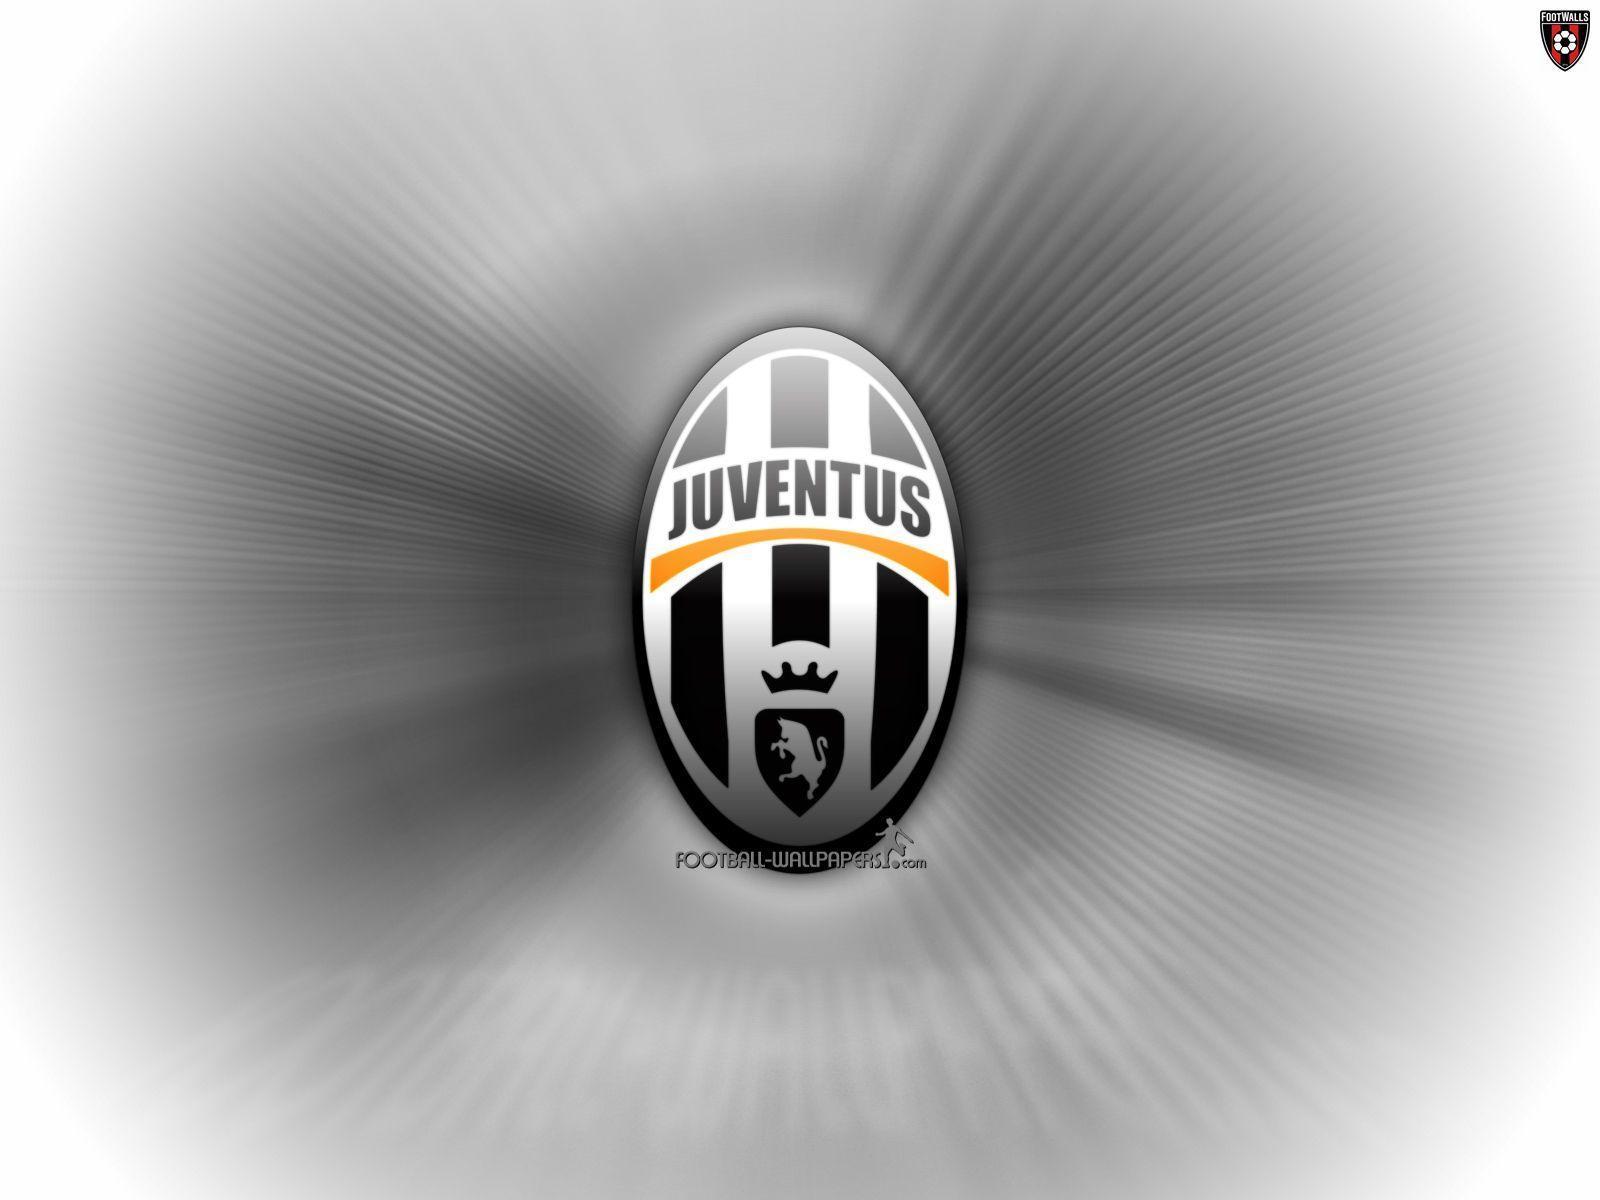 Juventus Wallpaper #24 - Football Wallpapers